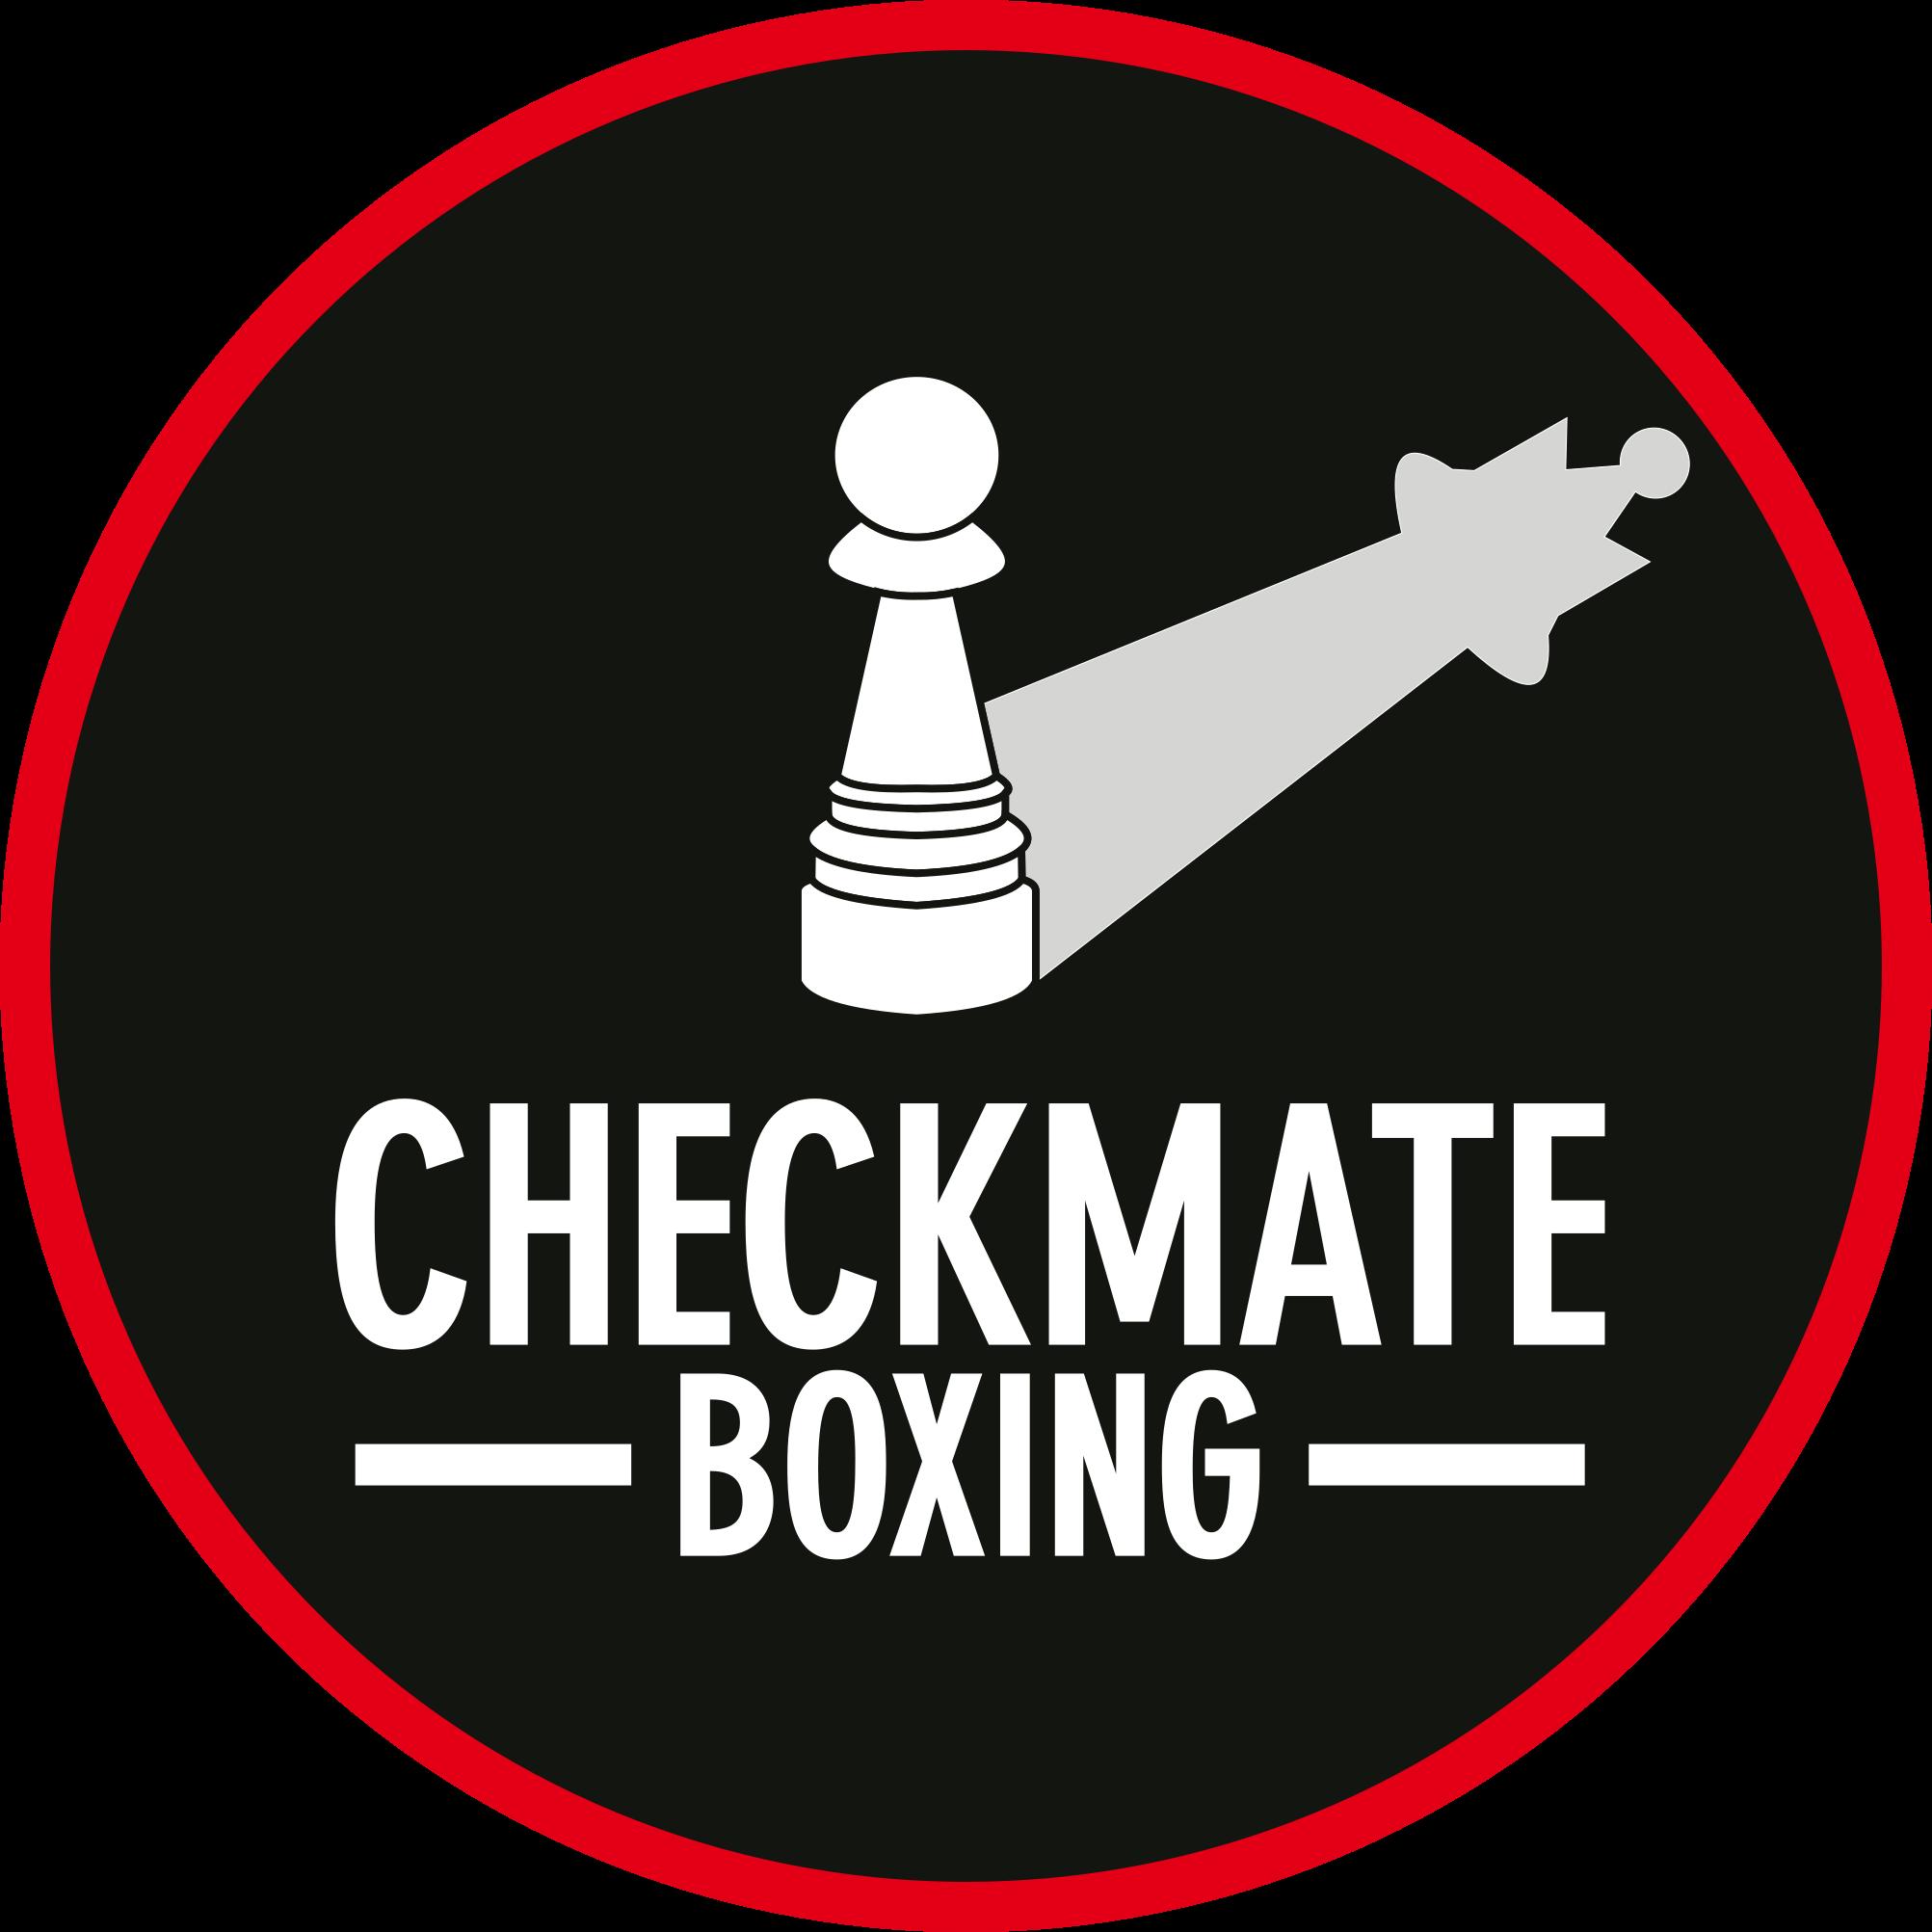 Checkmate Boxing - San Jose's Boxing Gym & Fitness Studio